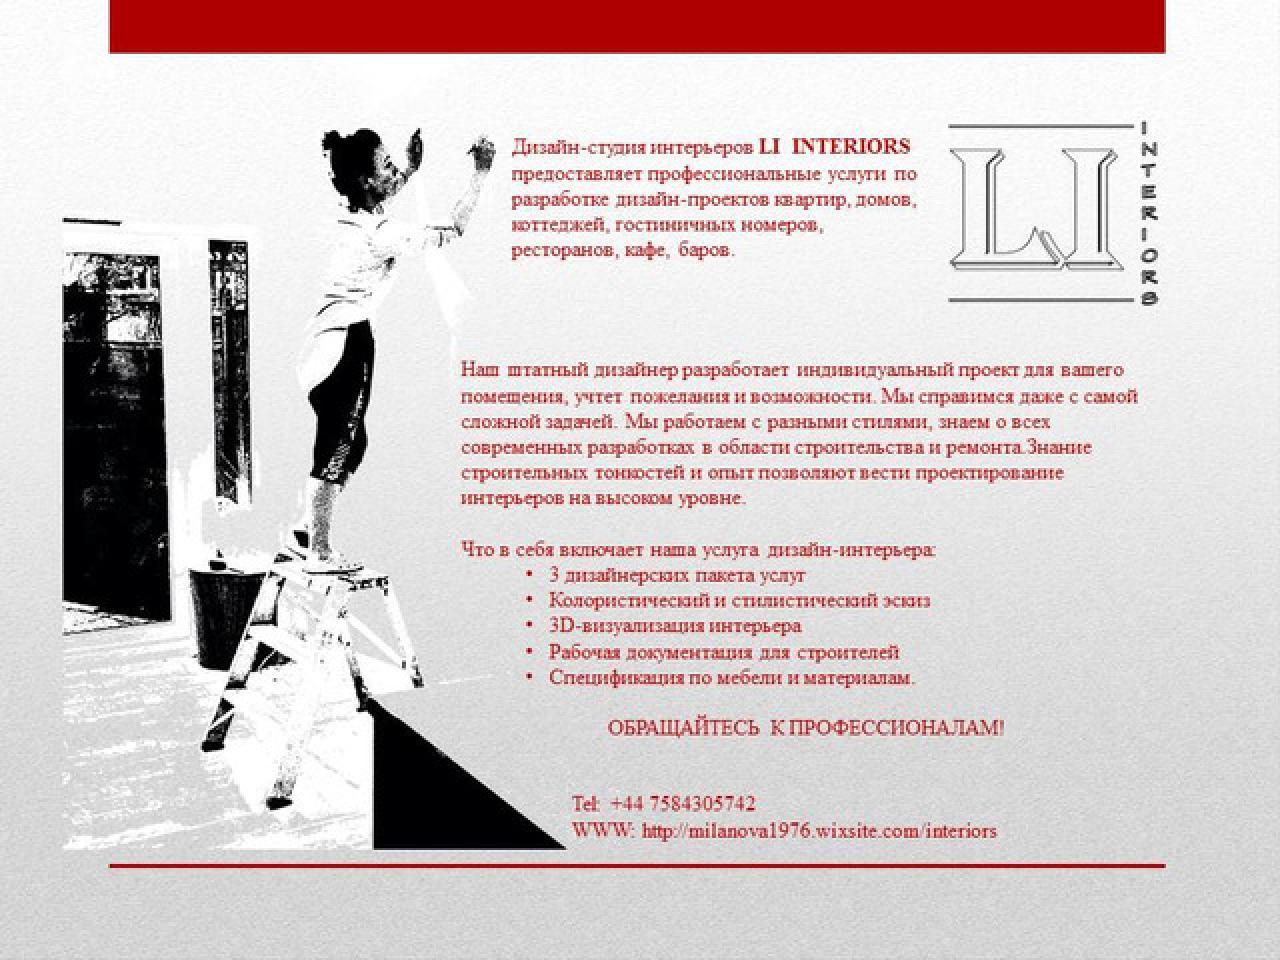 Дизайн-студия интерьеров LI INTERIORS - 1